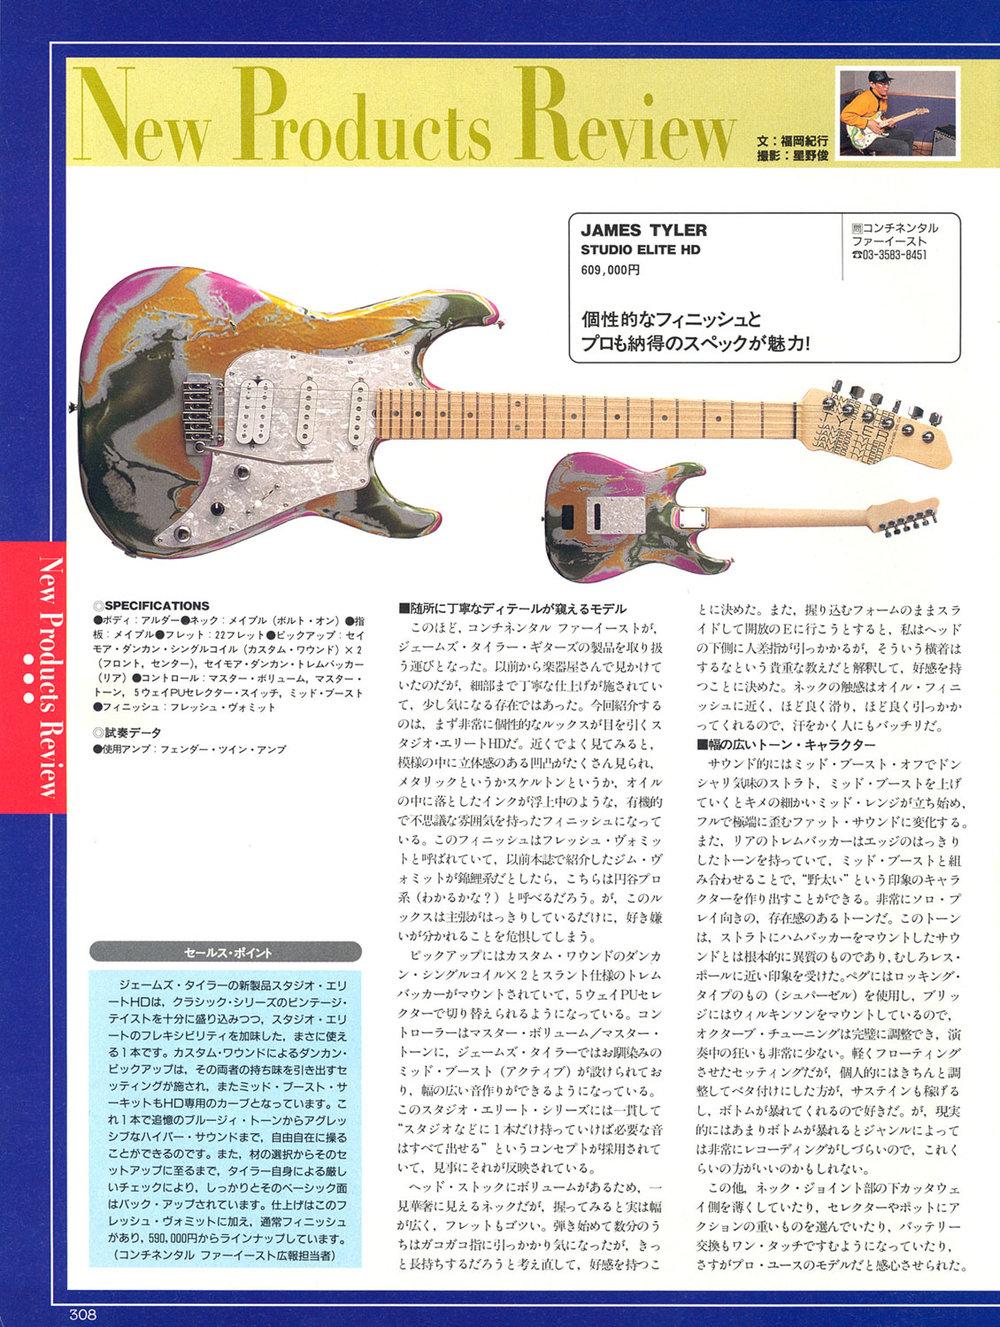 1999 Guitar Magazine - Jan.